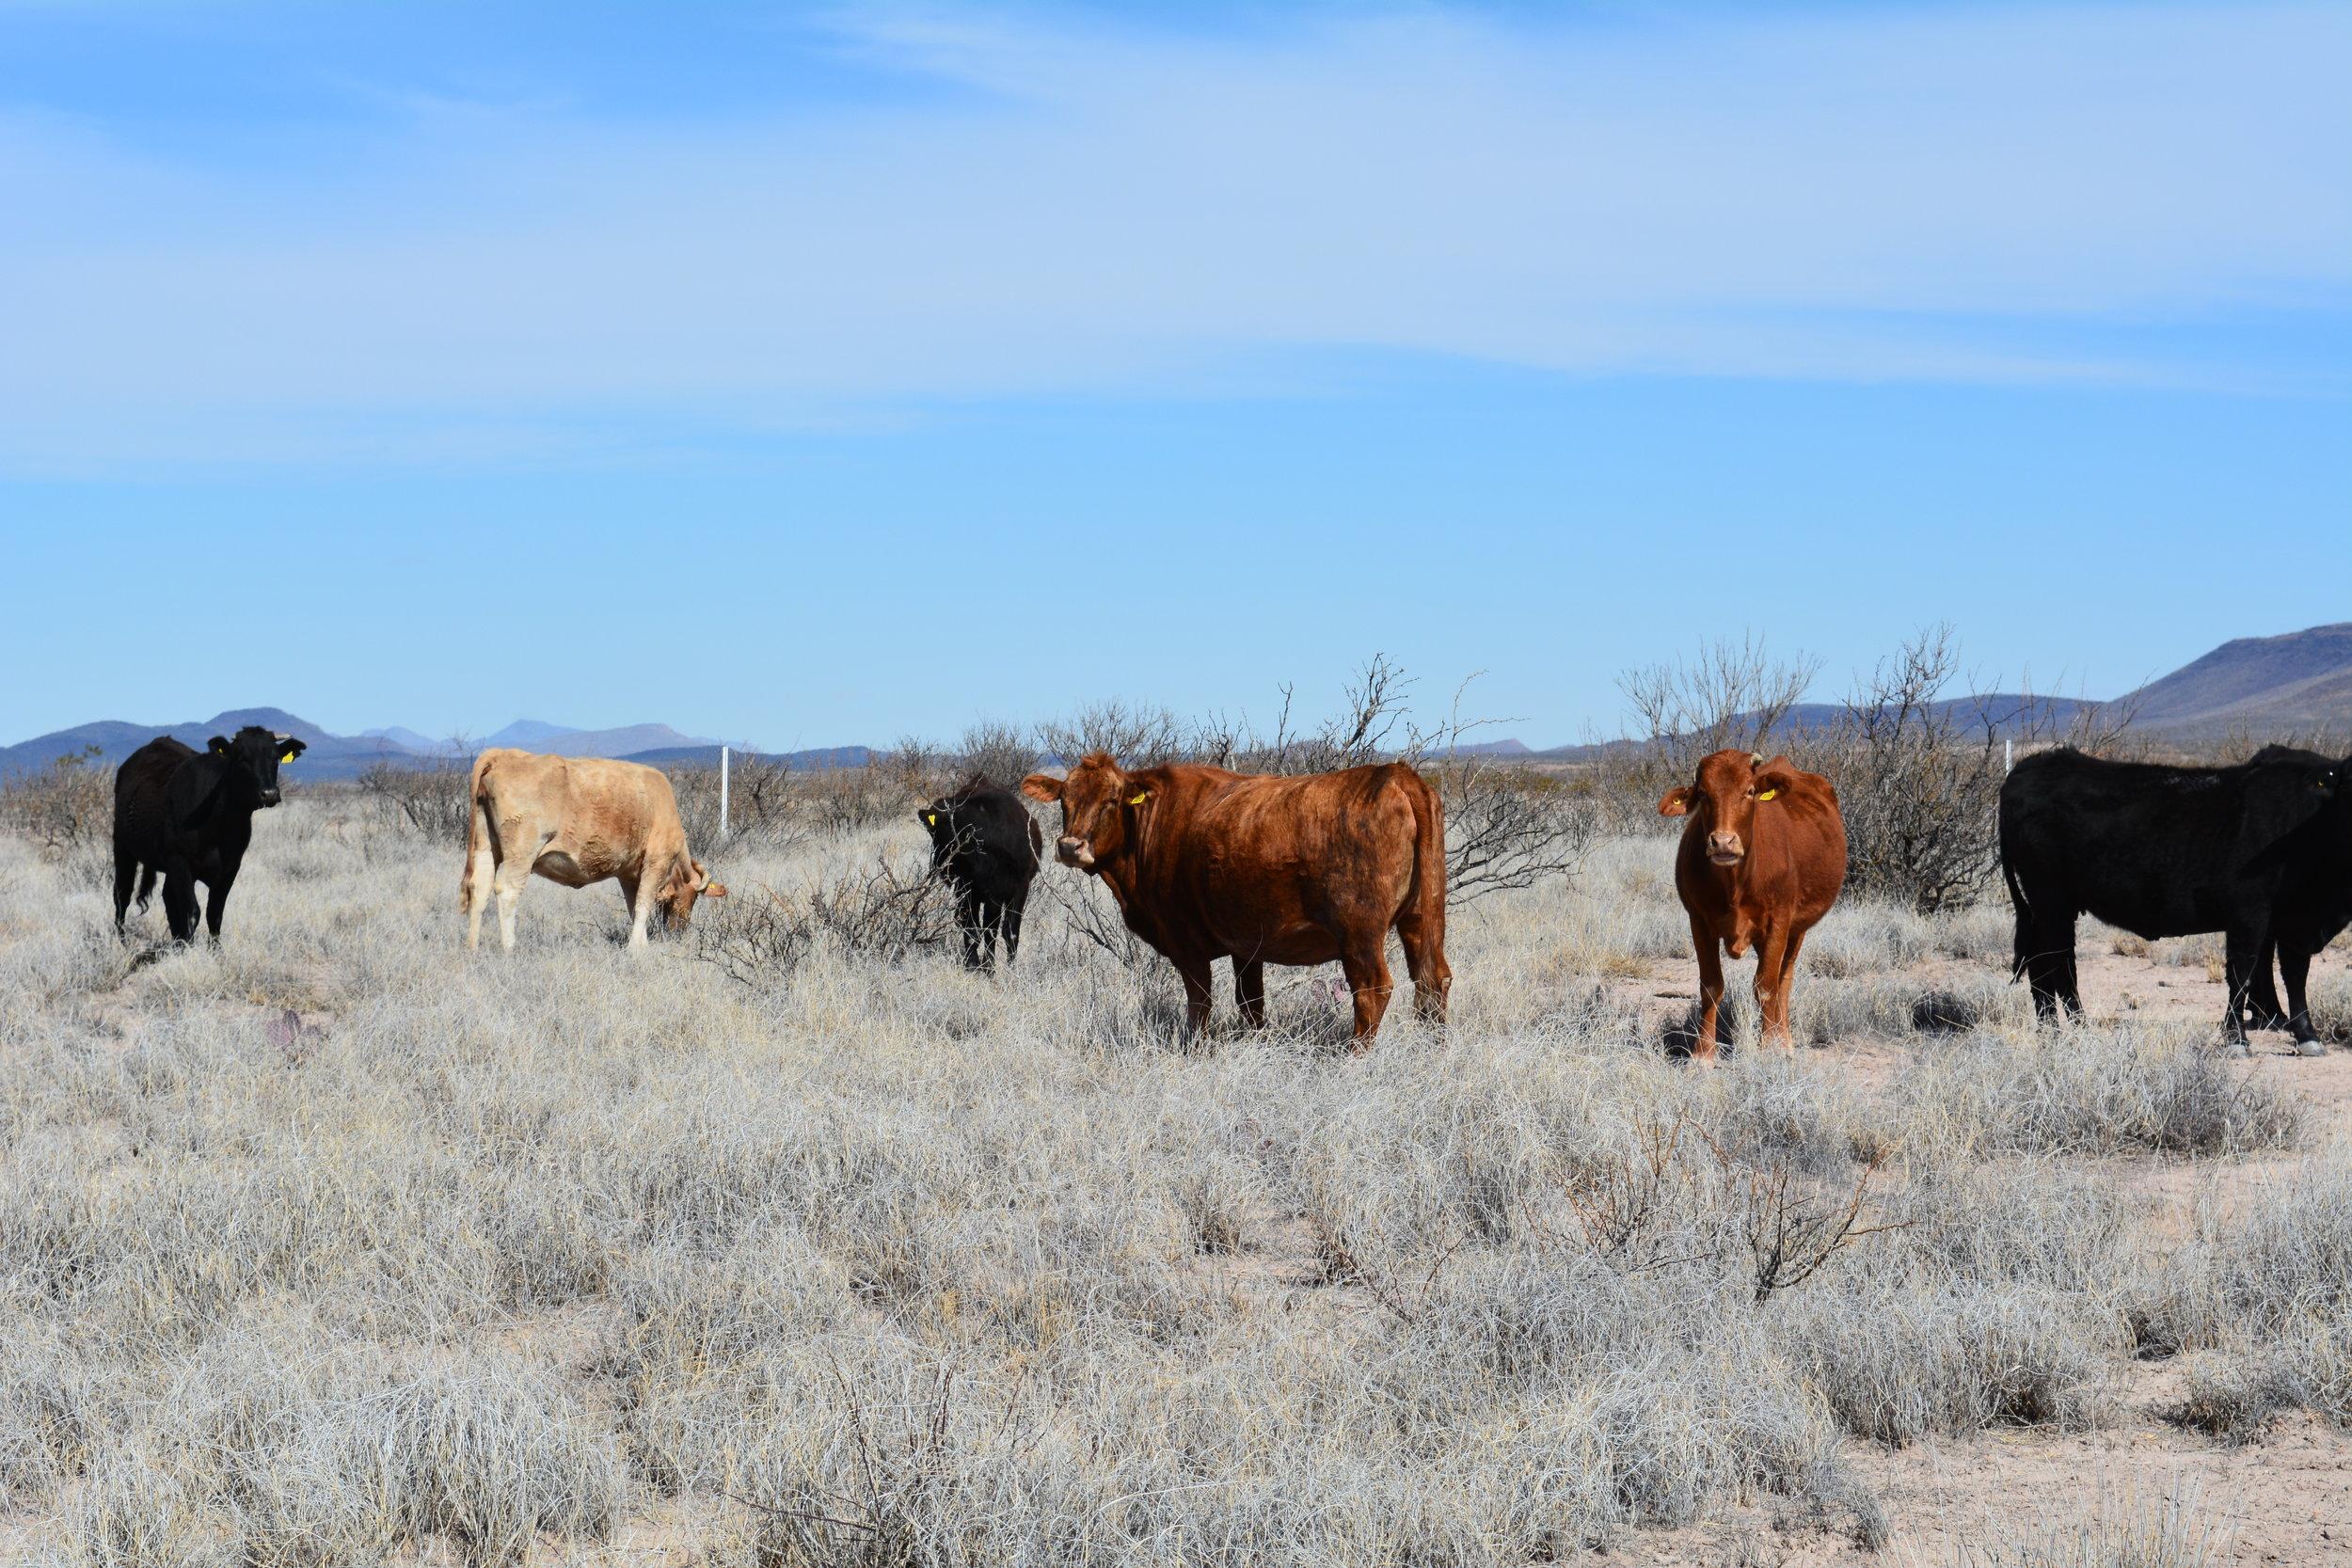 Animals grazing old forage